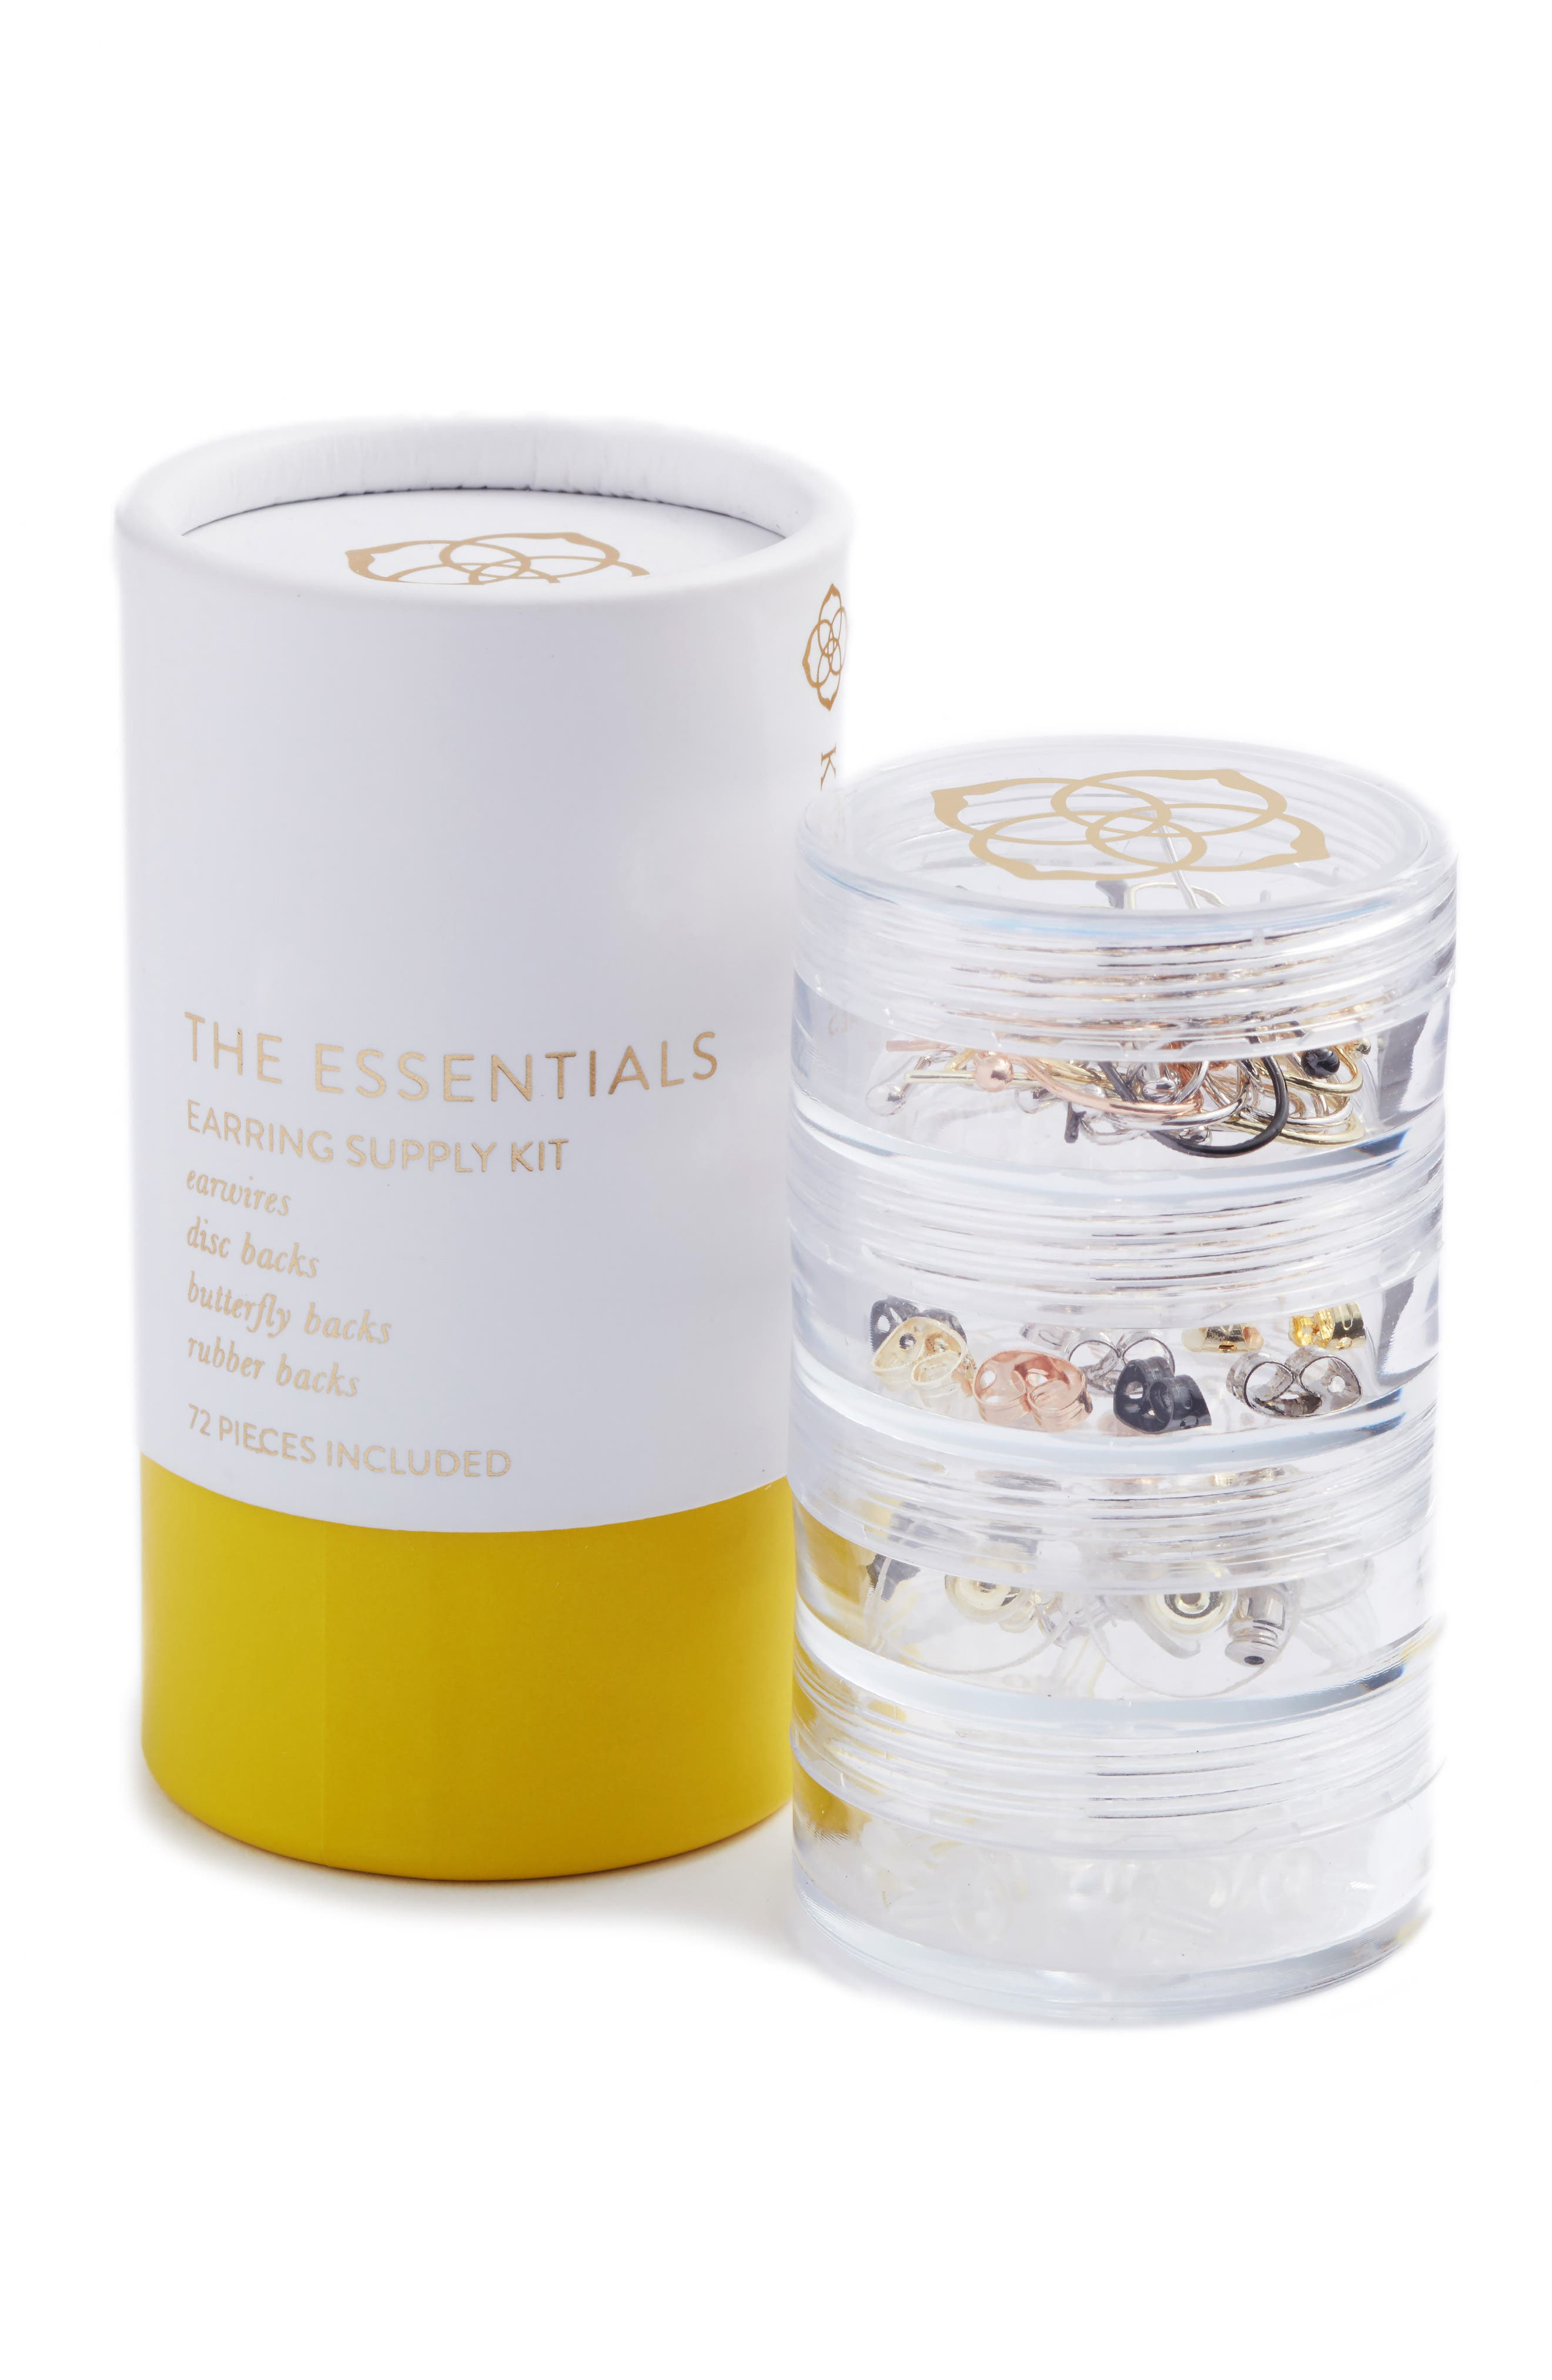 Main Image - Kendra Scott The Essentials Earring Supply Kit